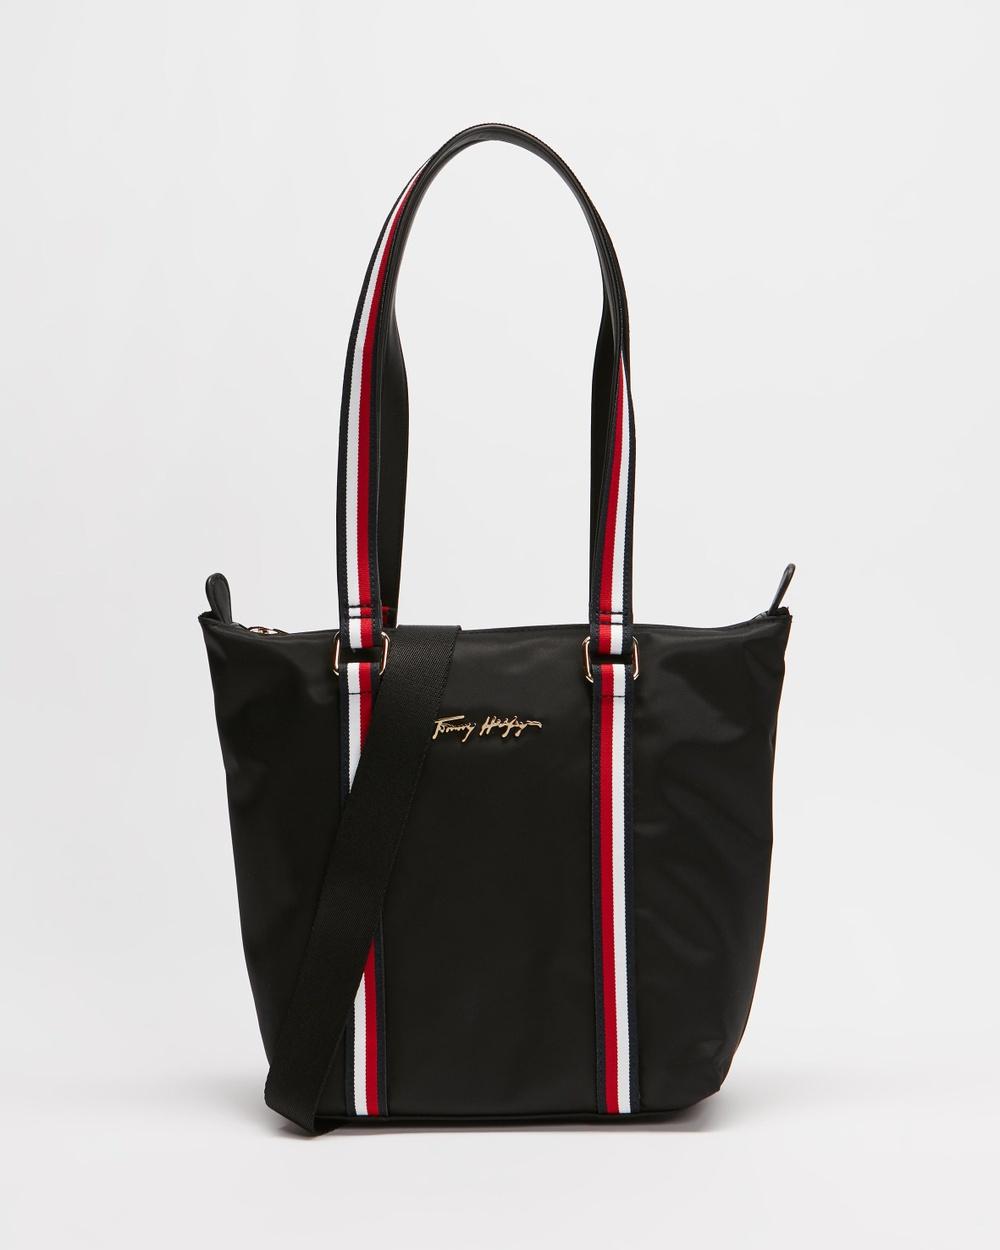 Tommy Hilfiger New Nylon Small Tote Handbags Black